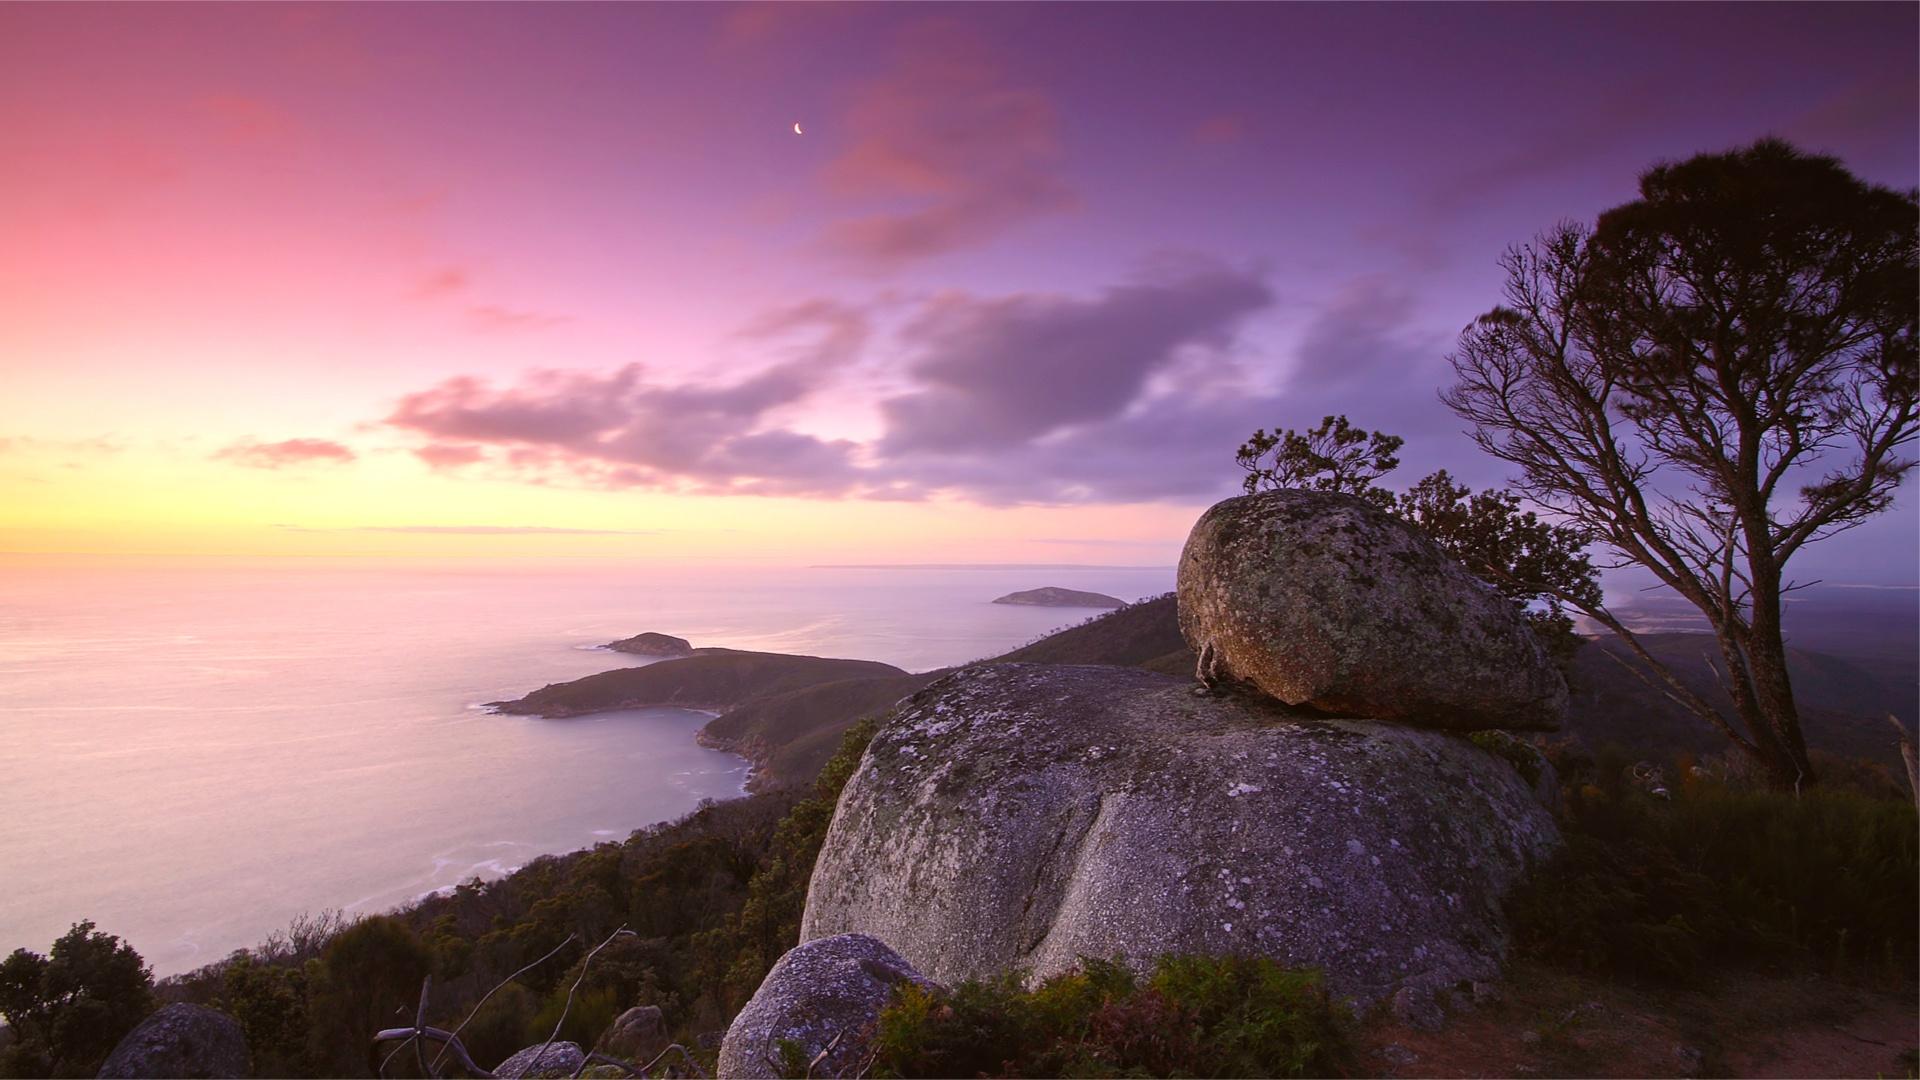 Calming-Sky-Pictures-8